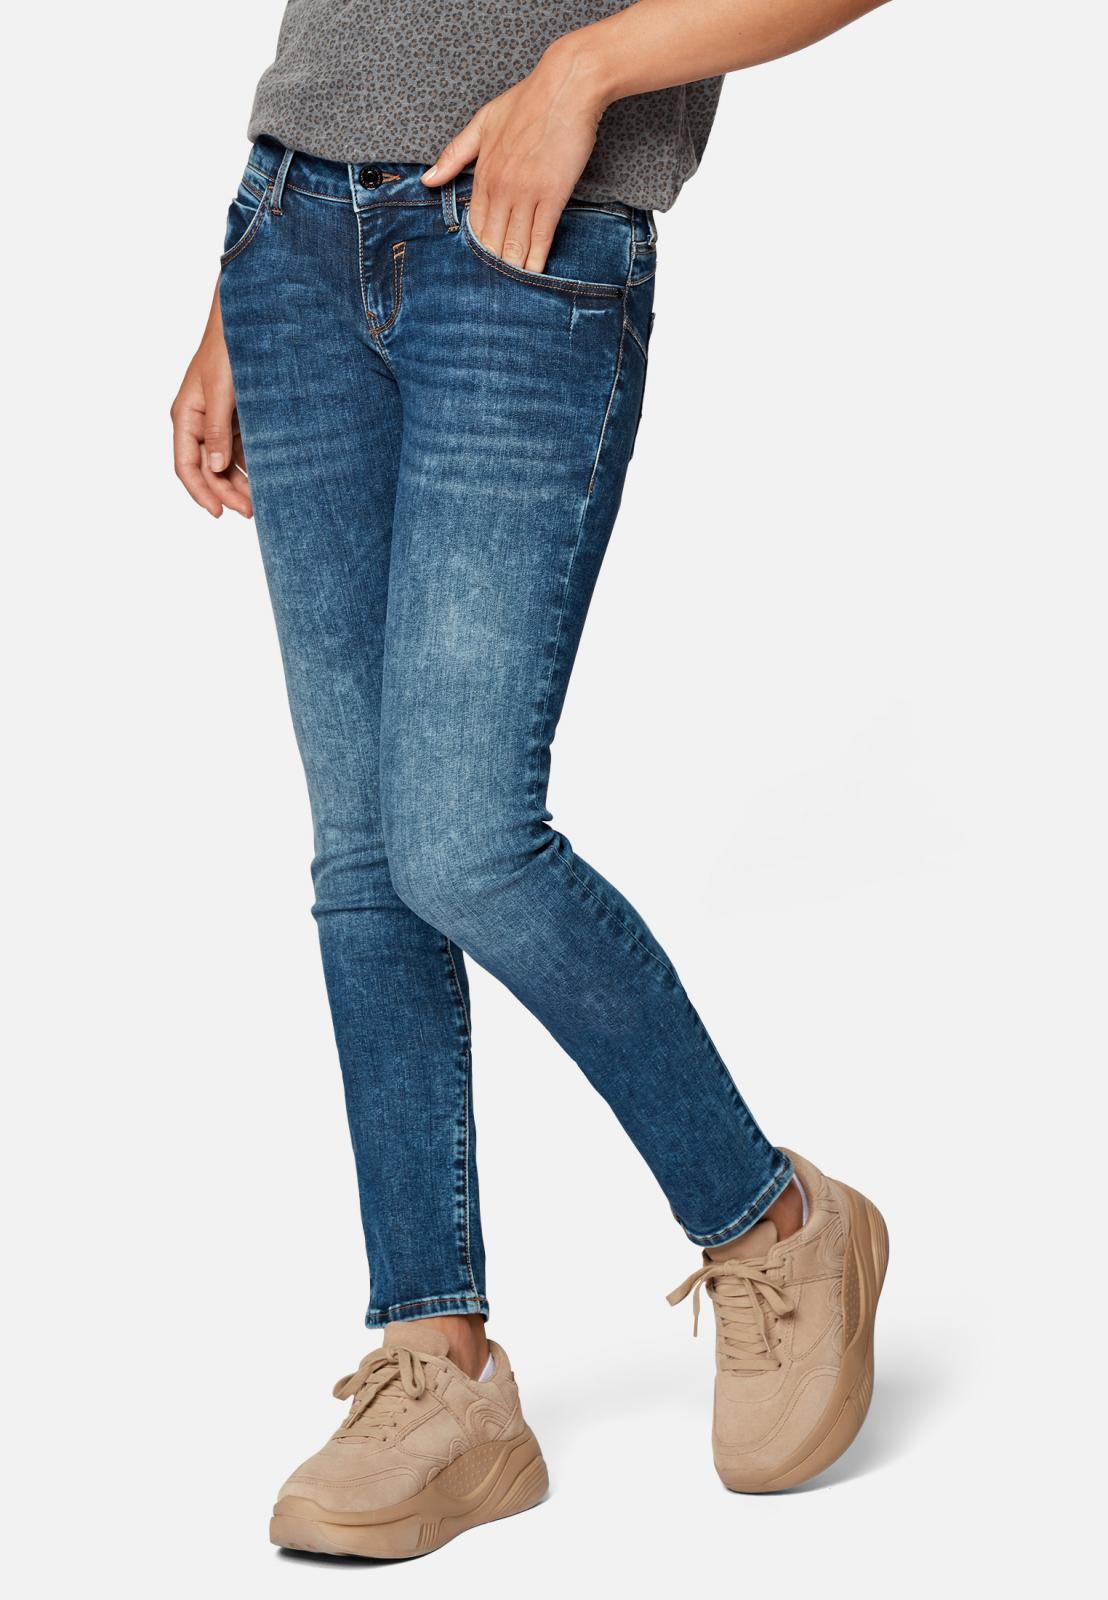 Mavi Lindy Low Rise Skinny Jeans in Dakr Brushed Glam